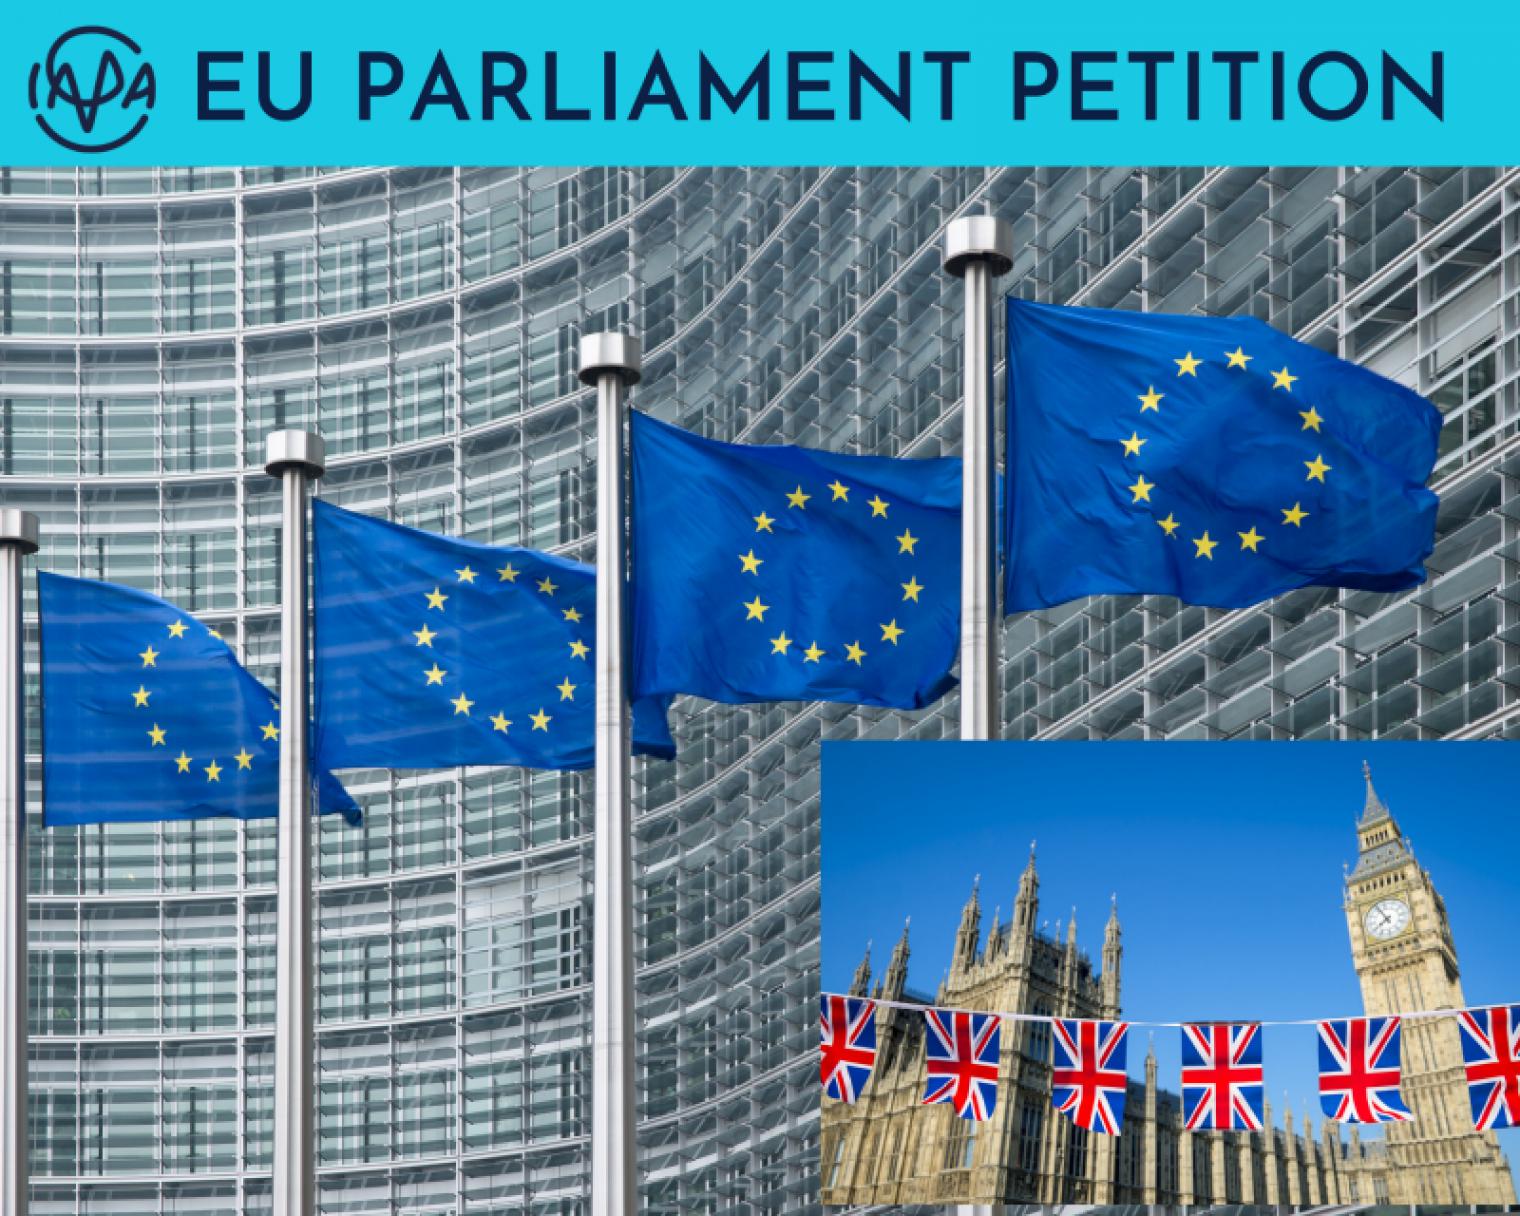 IAPA files a petition with the EU Parliament